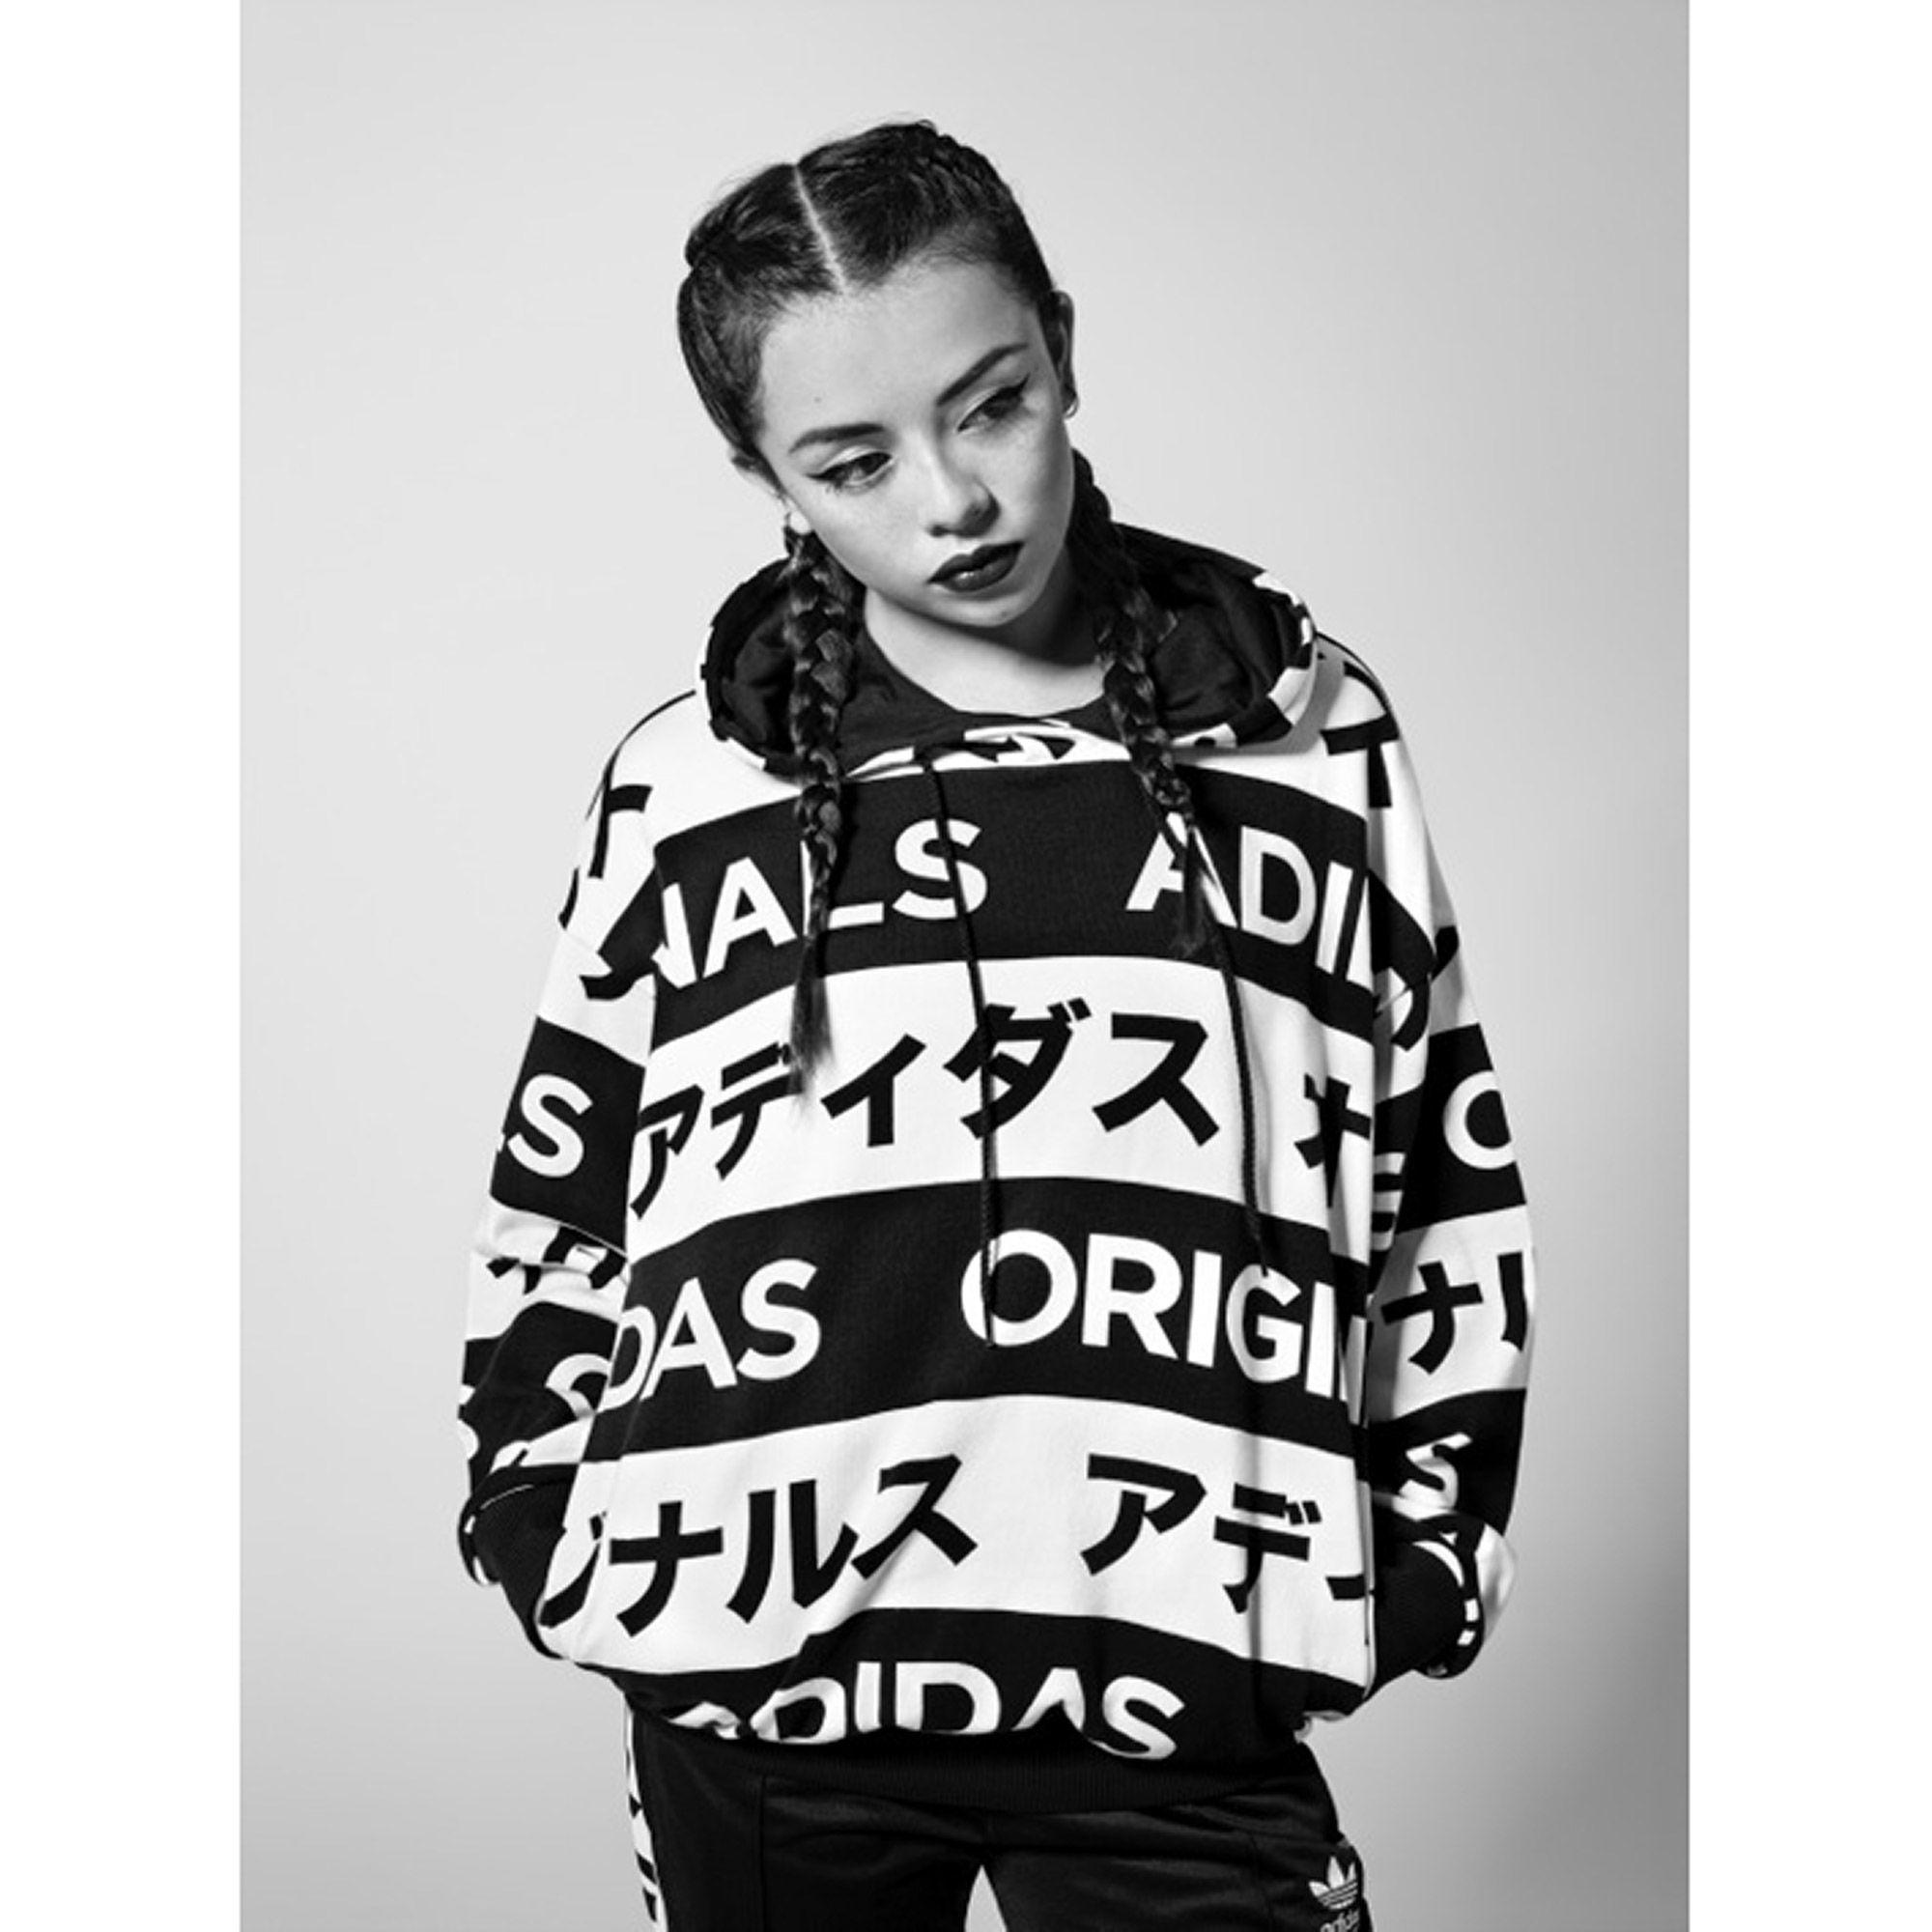 Adidas Typo Hoodie Adidas Us Streetwear Adidas Originals Moda [ 2000 x 2000 Pixel ]